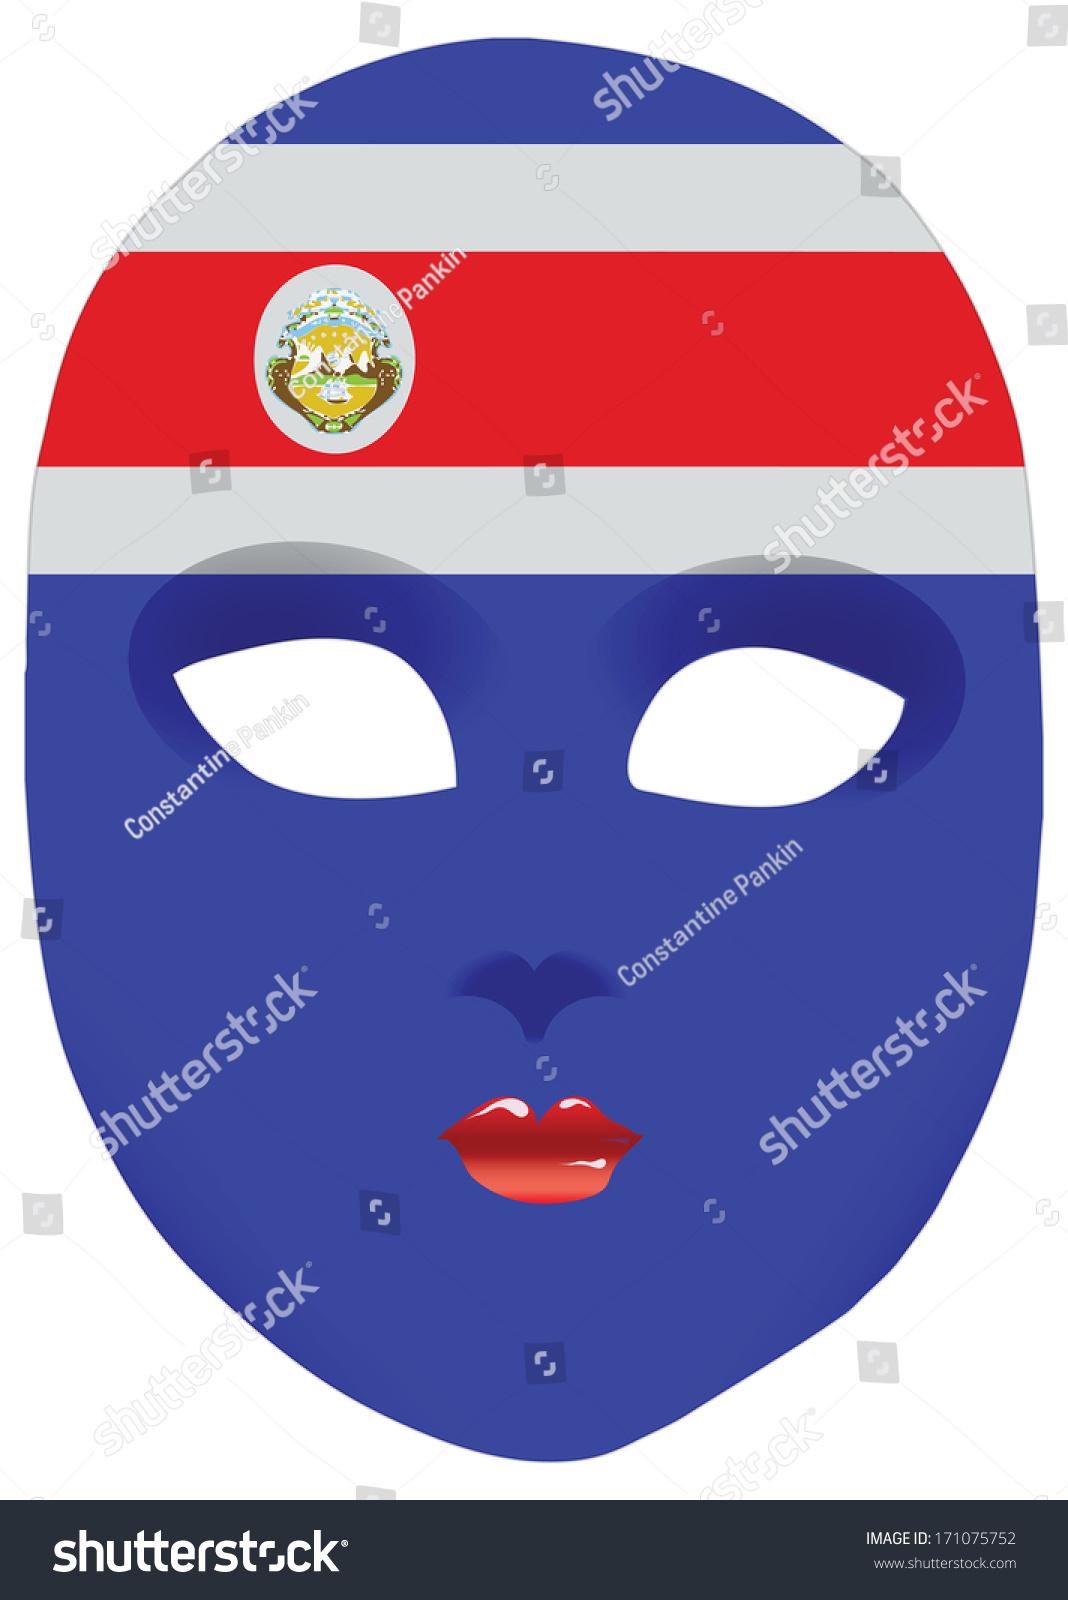 Classic mask symbols statehood costa rica stock vector 171075752 classic mask with symbols of statehood of costa rica vector illustration biocorpaavc Gallery